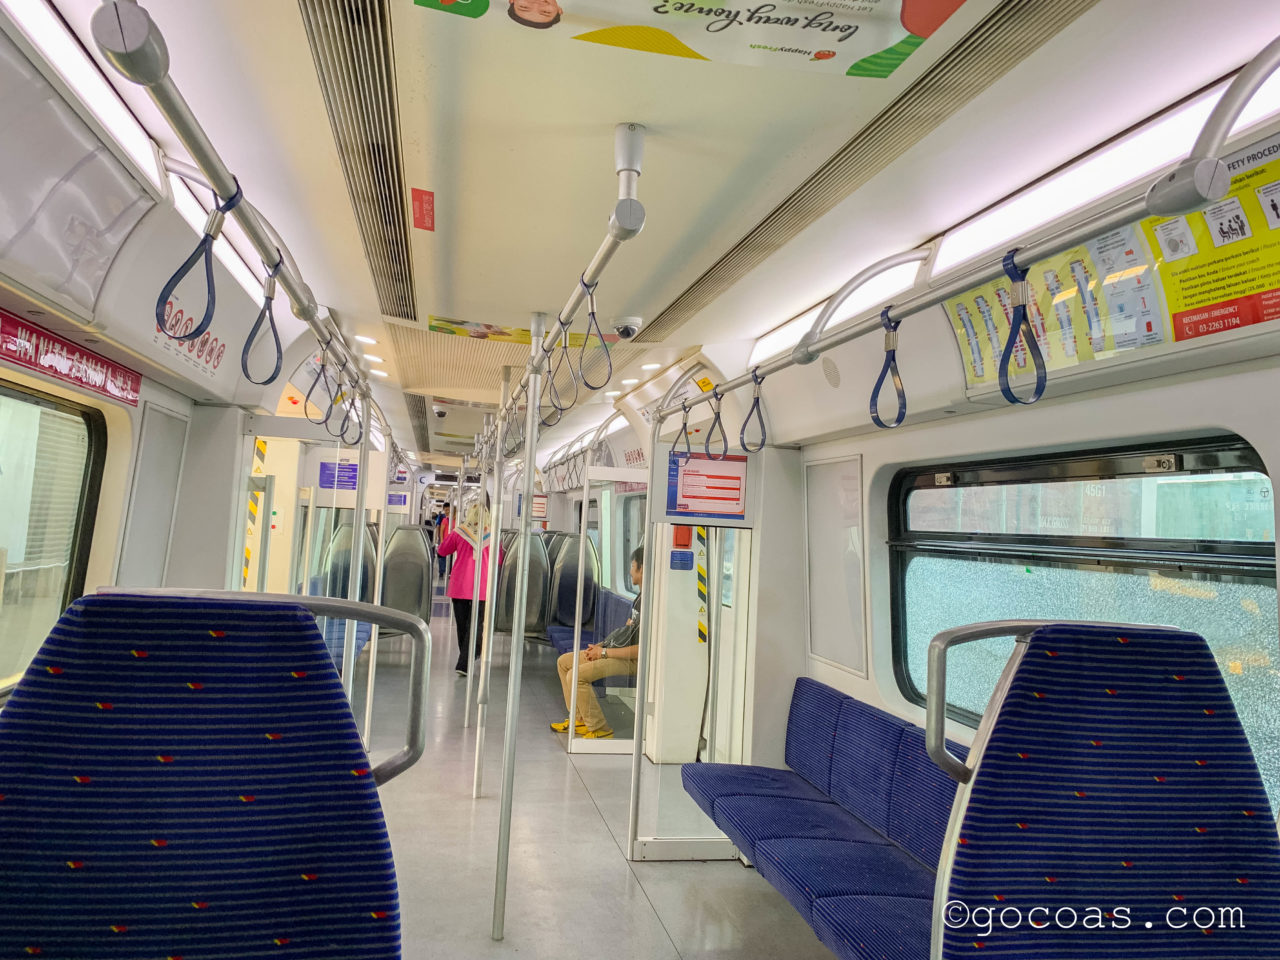 Padang Besar駅で乗ったButtrerworth行きの電車内